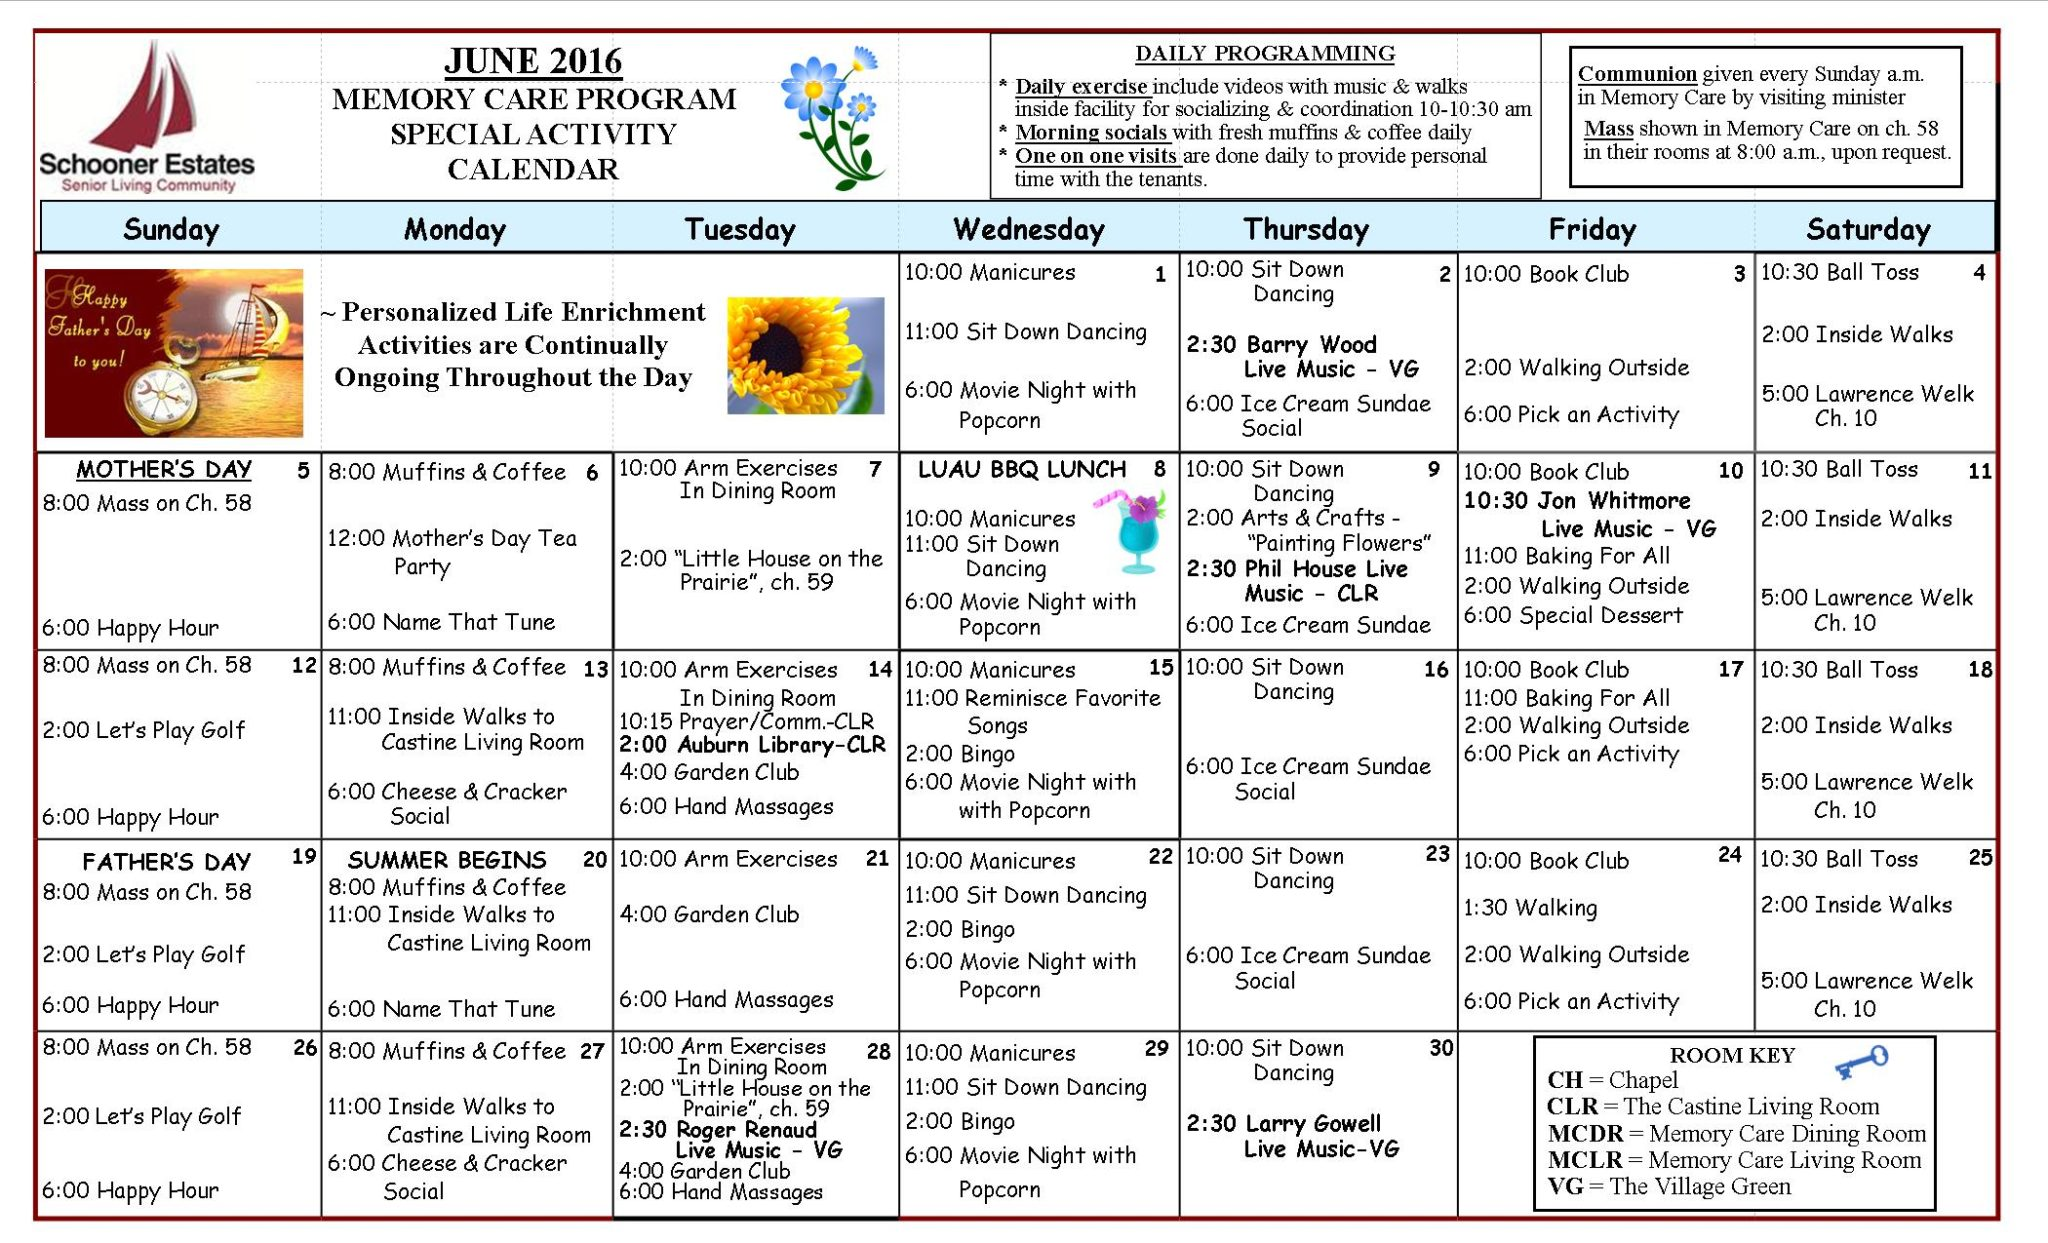 June 2016 Memory Care Activity Calendar